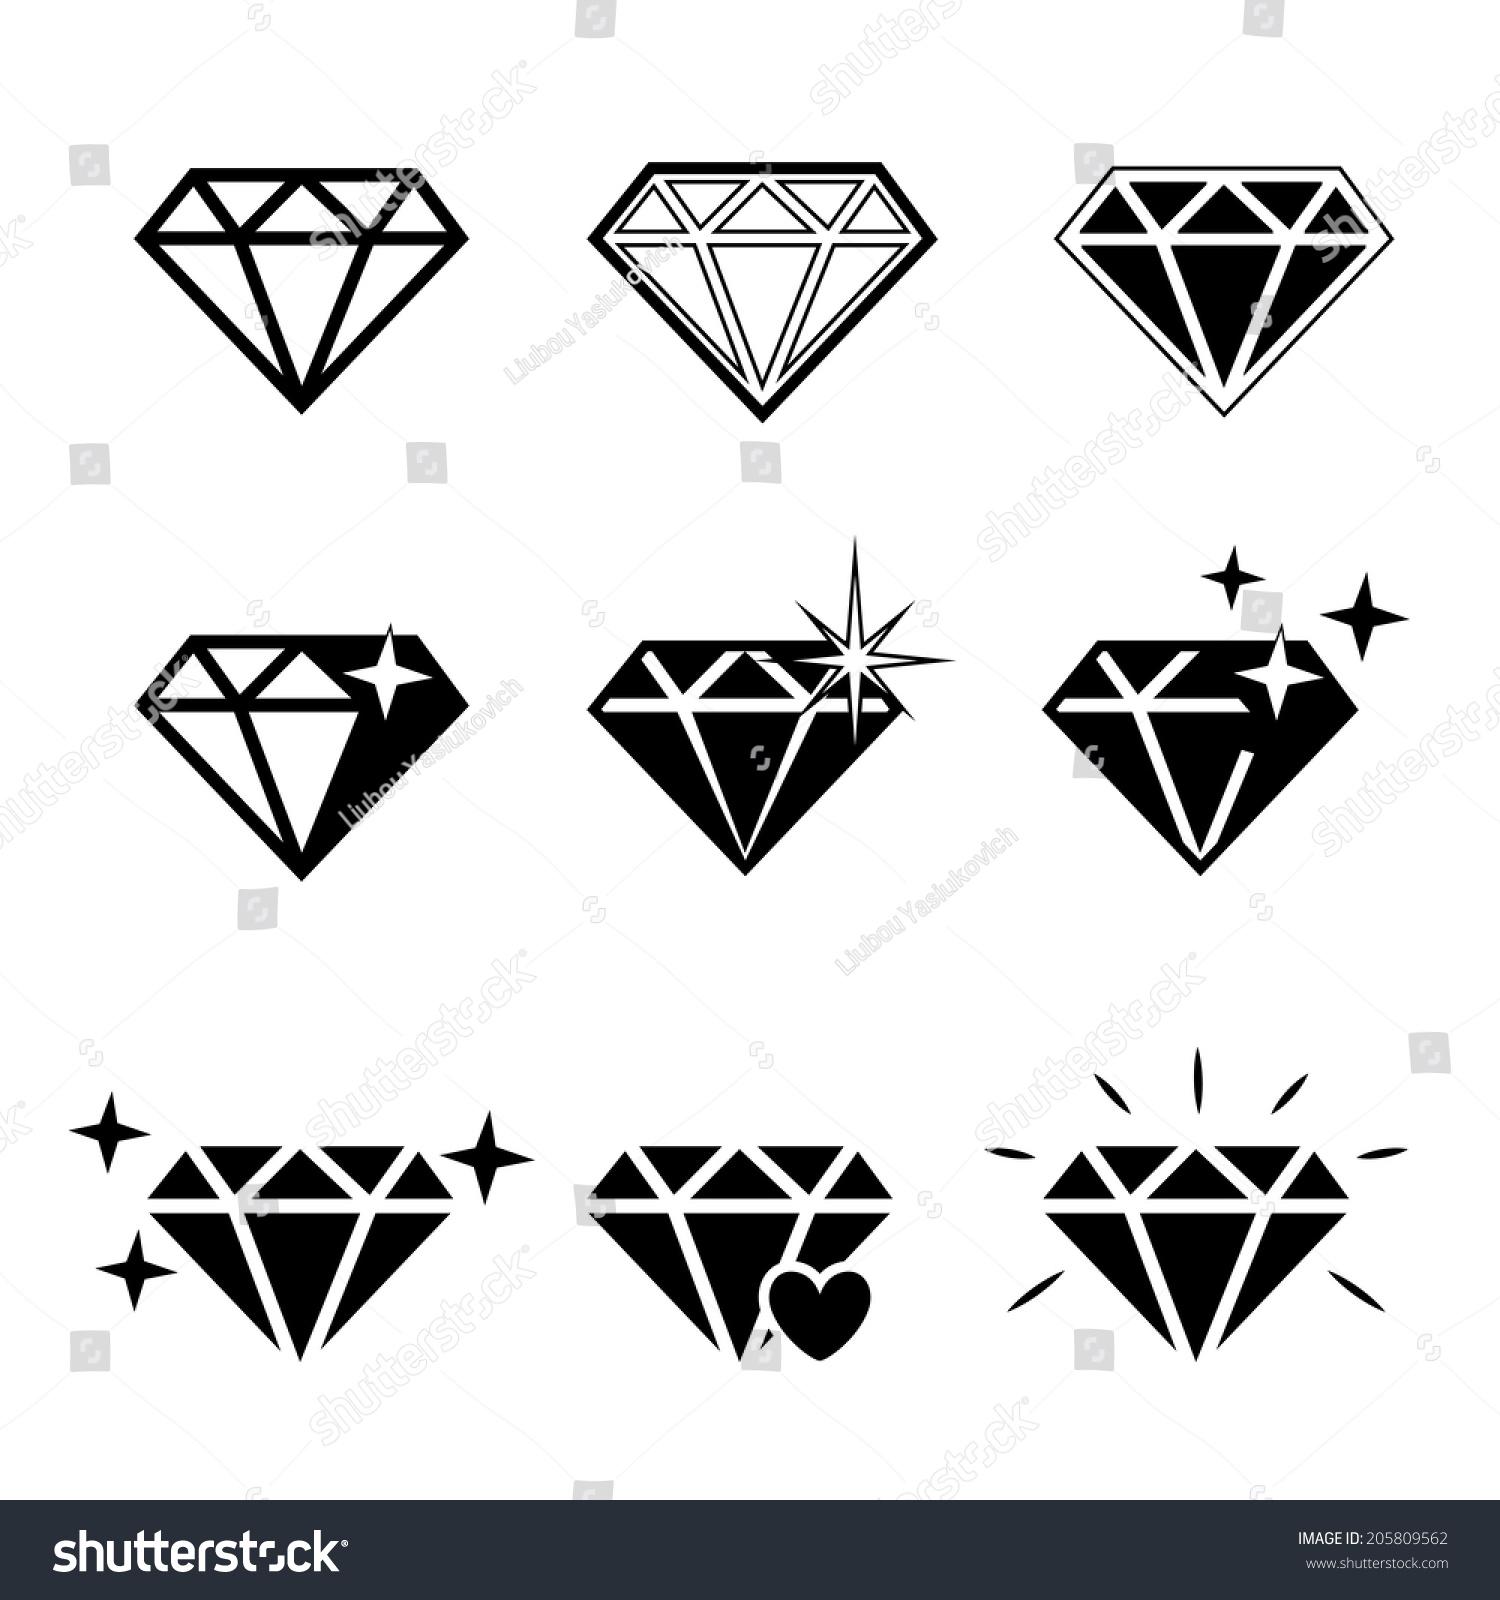 diamond vector icons set on white stock vector 205809562